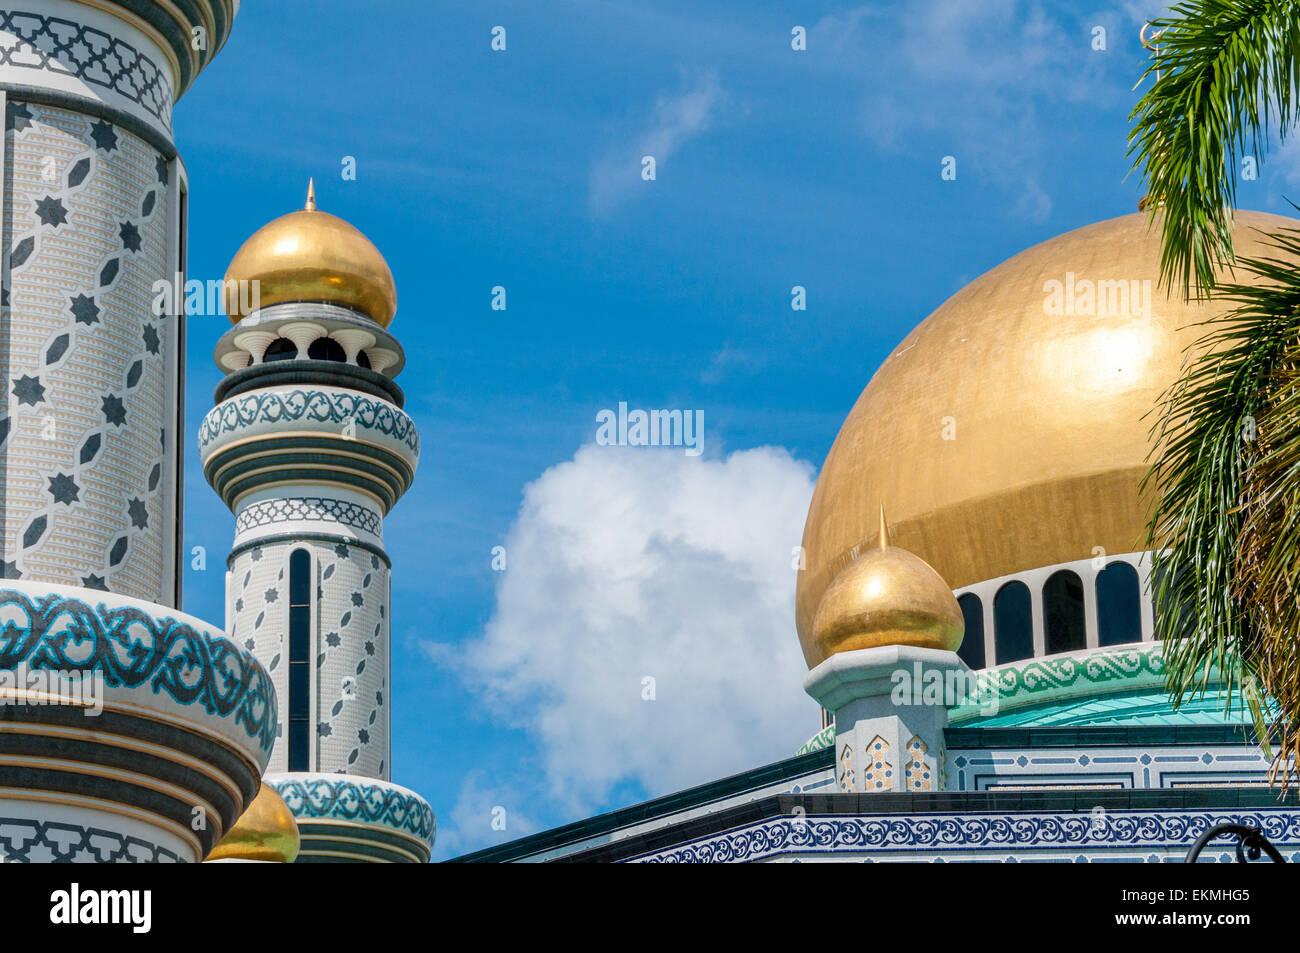 Jame'asr Hassanil Bolkiah Mosque, Bandar Seri Begawan, Brunei - Stock Image